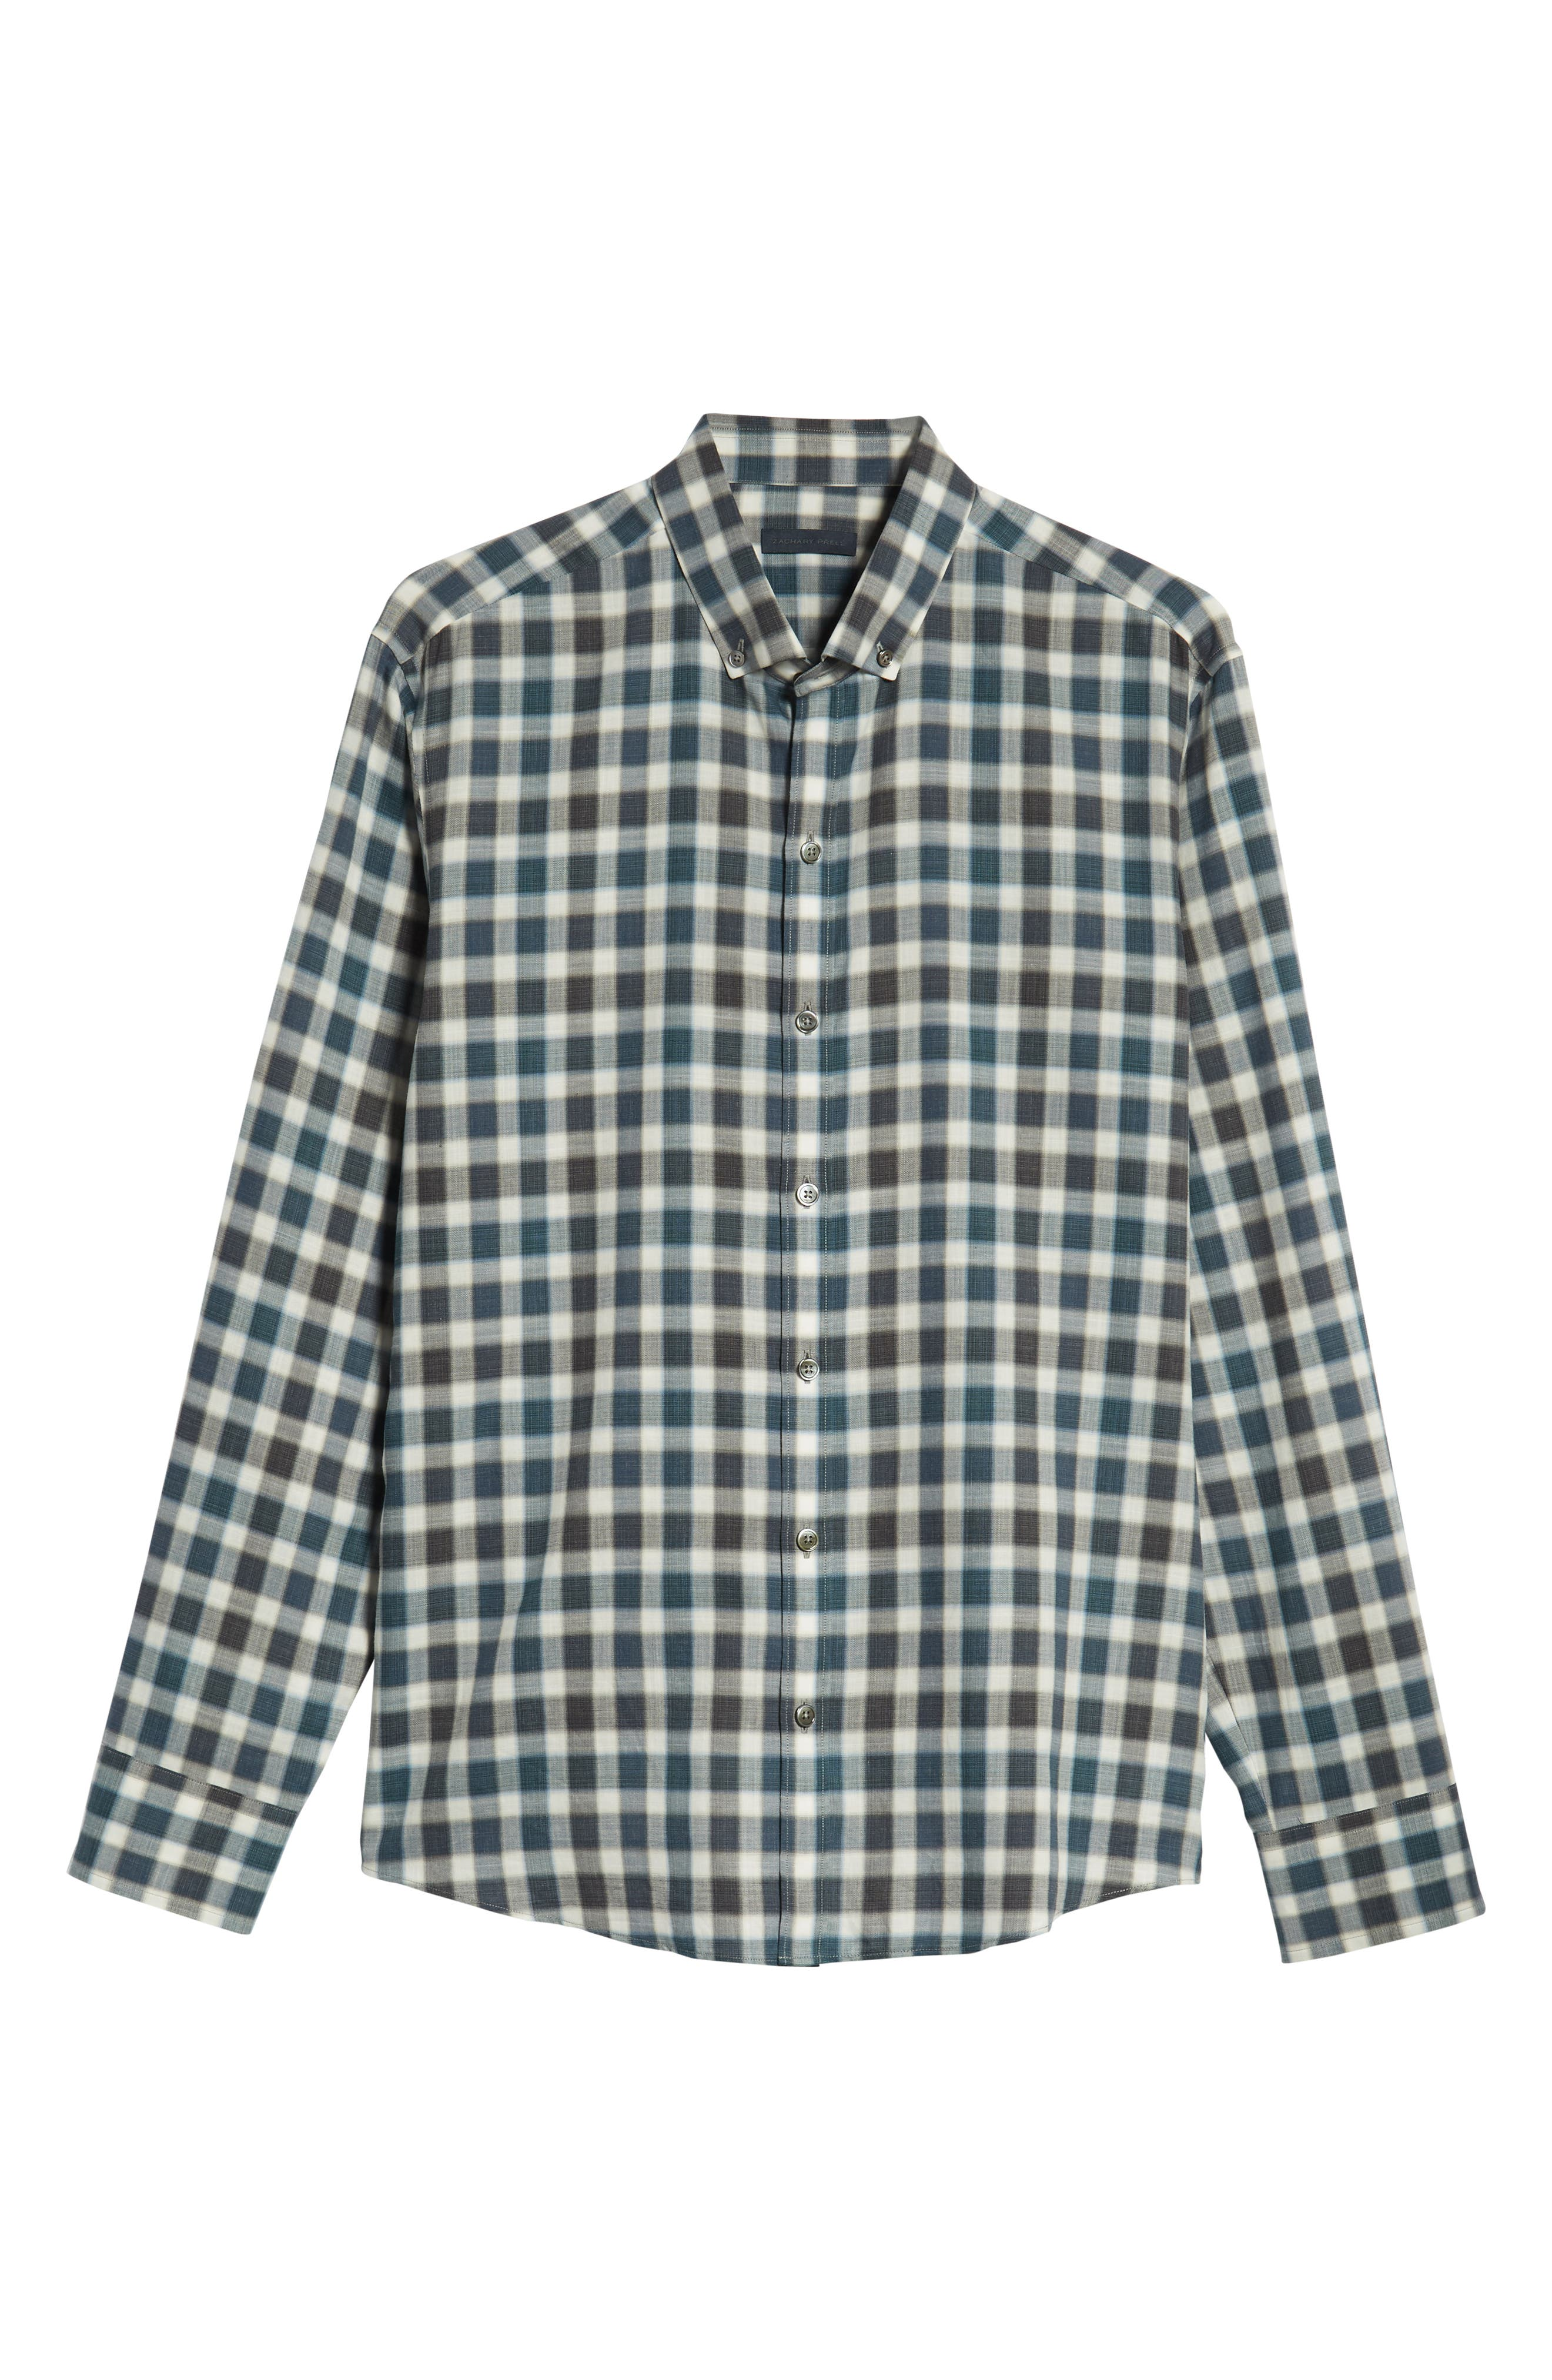 Buffa Plaid Flannel Sport Shirt,                             Alternate thumbnail 5, color,                             DARK TEAL